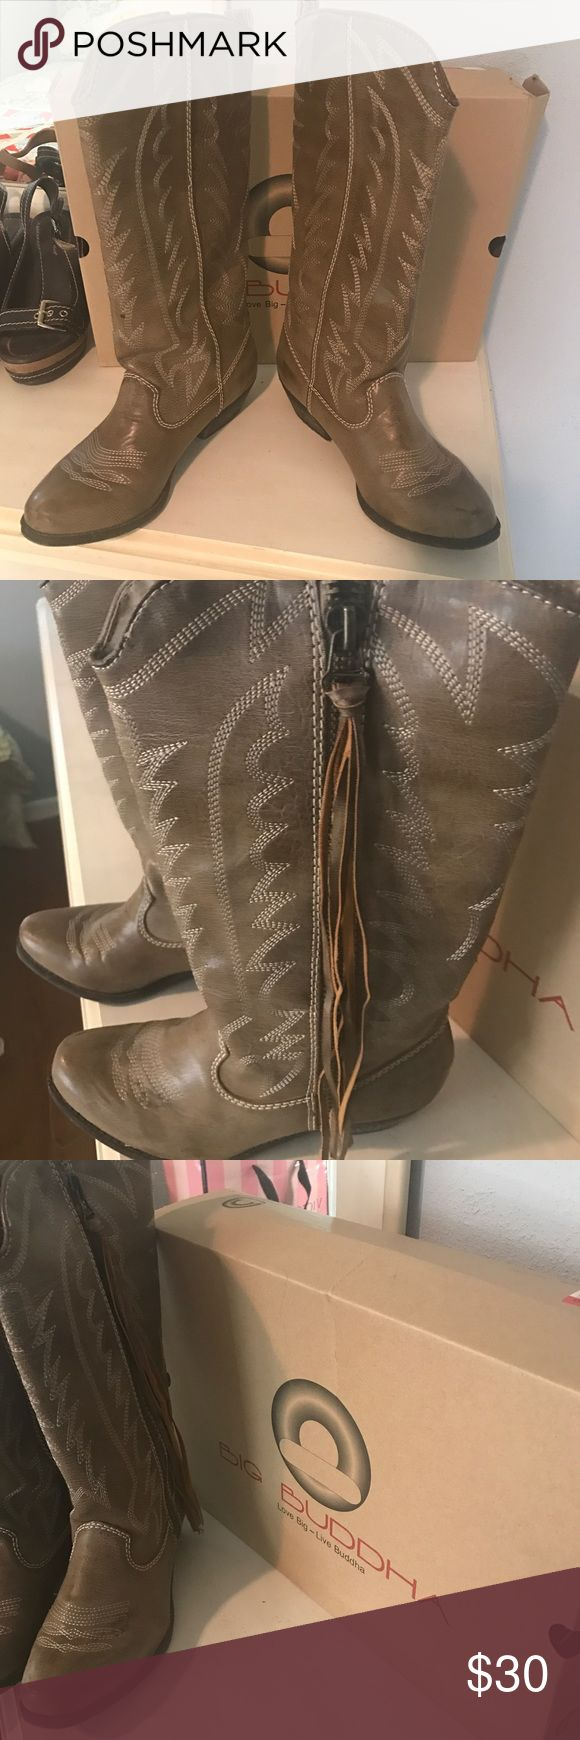 Big Buddha - size 9.5 - zip up - cowgirl boots Lightly worn Bug Buddha round toe cowgirl  boots - small heel. Big Buddha Shoes Heeled Boots